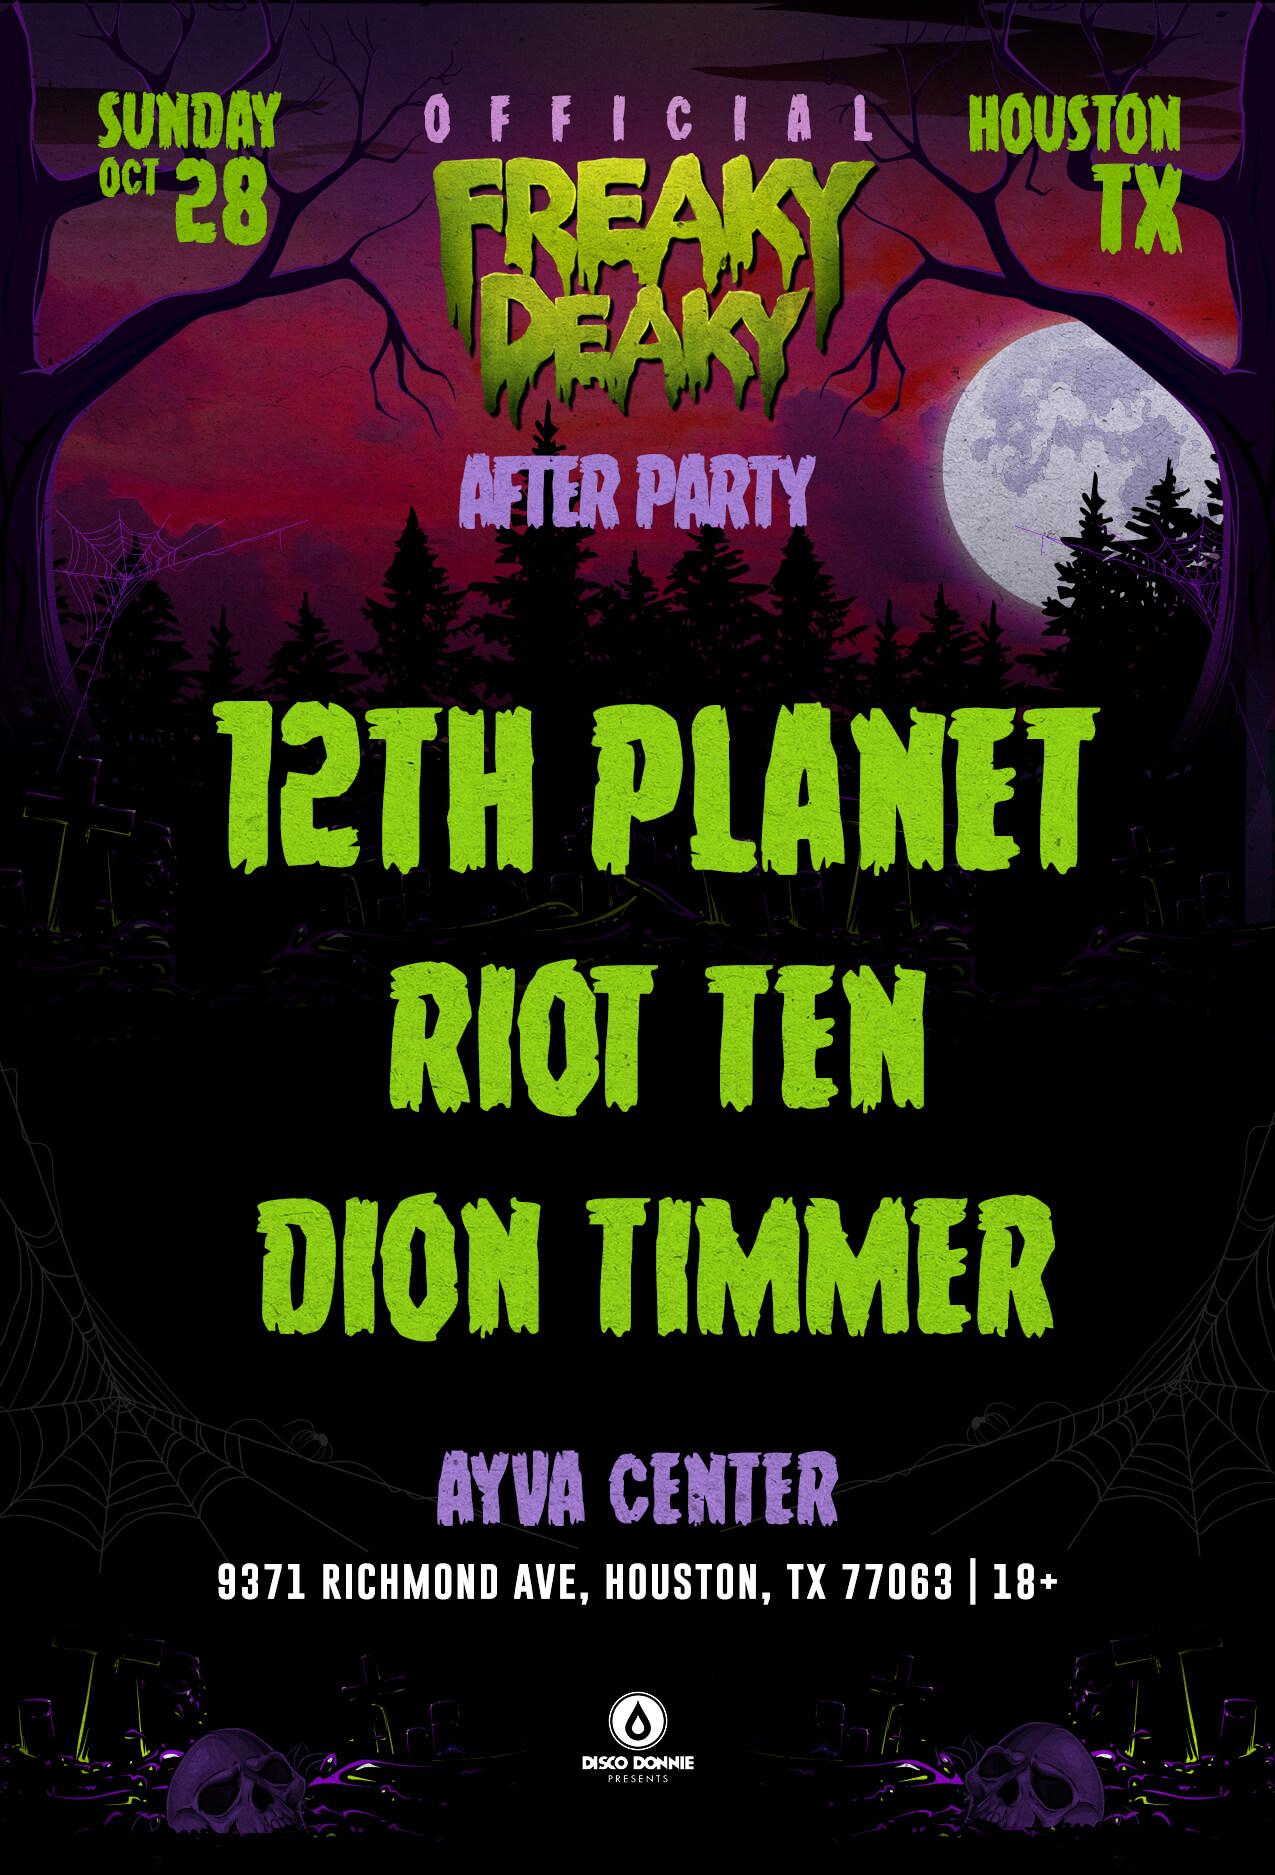 12th Planet, Riot Ten, Dion Timmer at Ayva Center